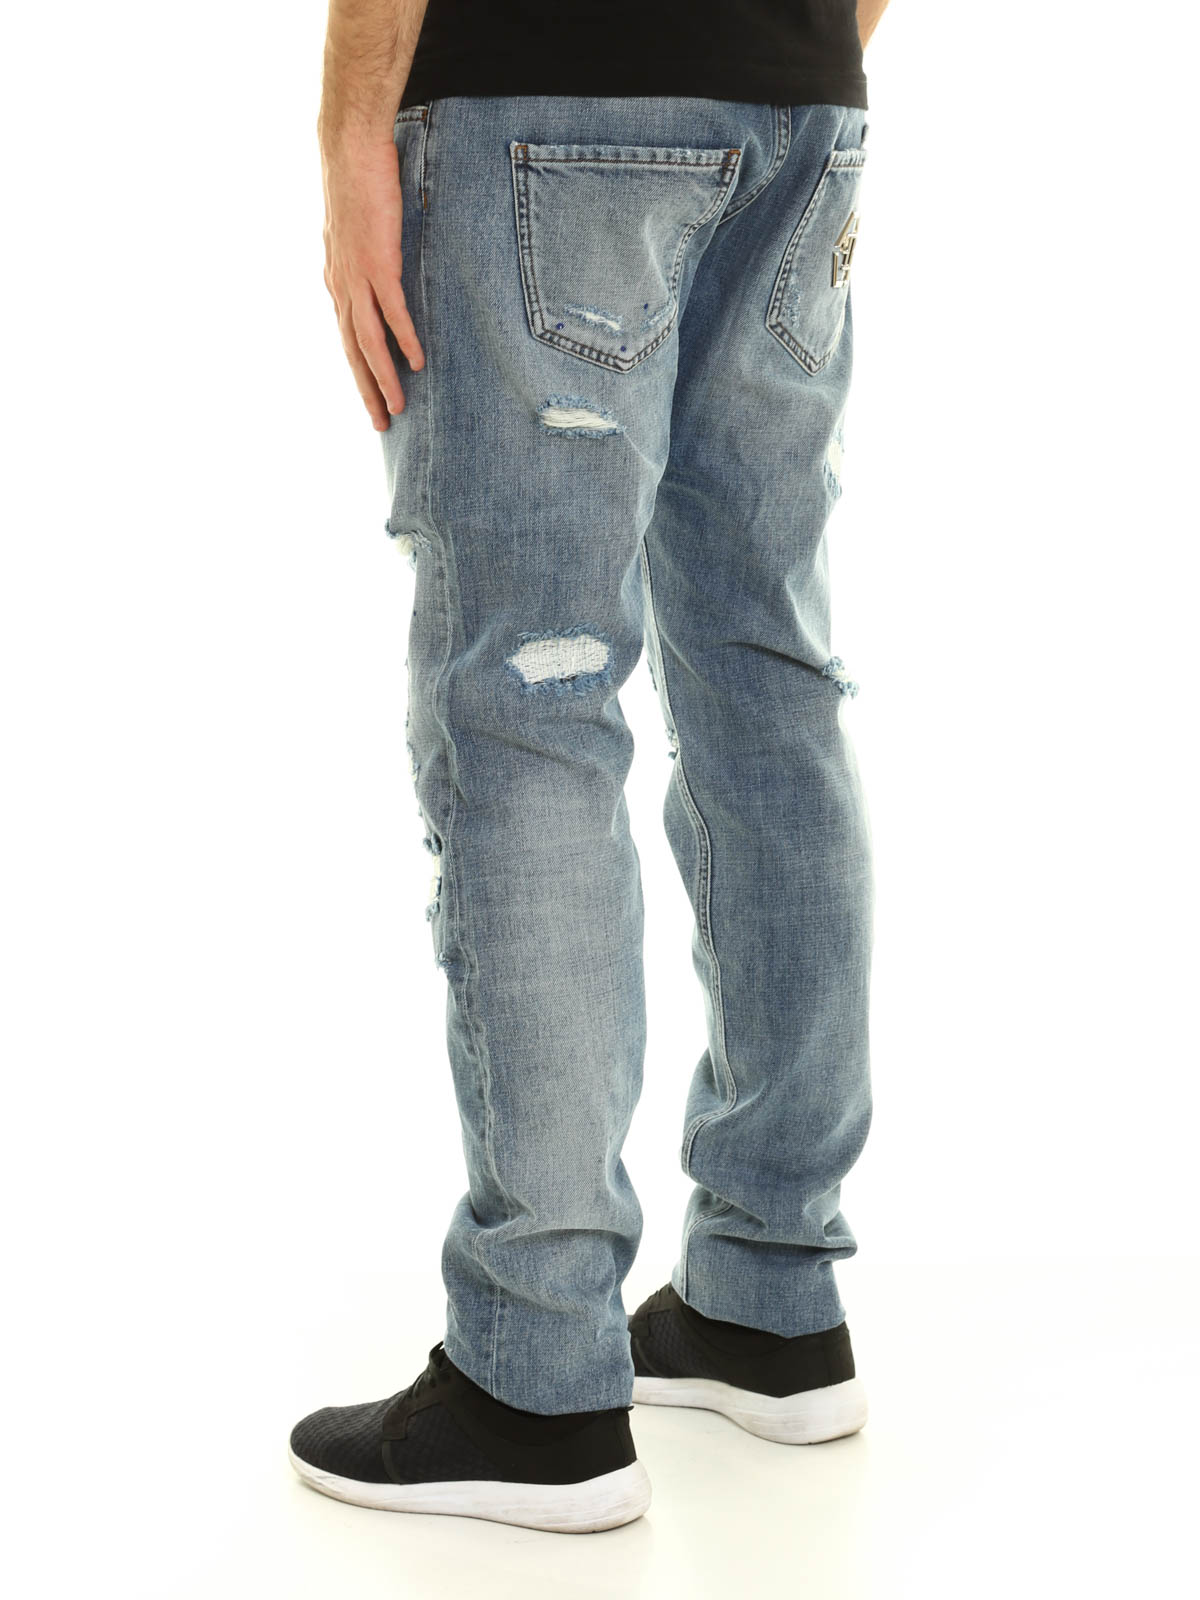 philipp plein rainbow denim jeans straight leg jeans mdt0062pde007n31wa. Black Bedroom Furniture Sets. Home Design Ideas